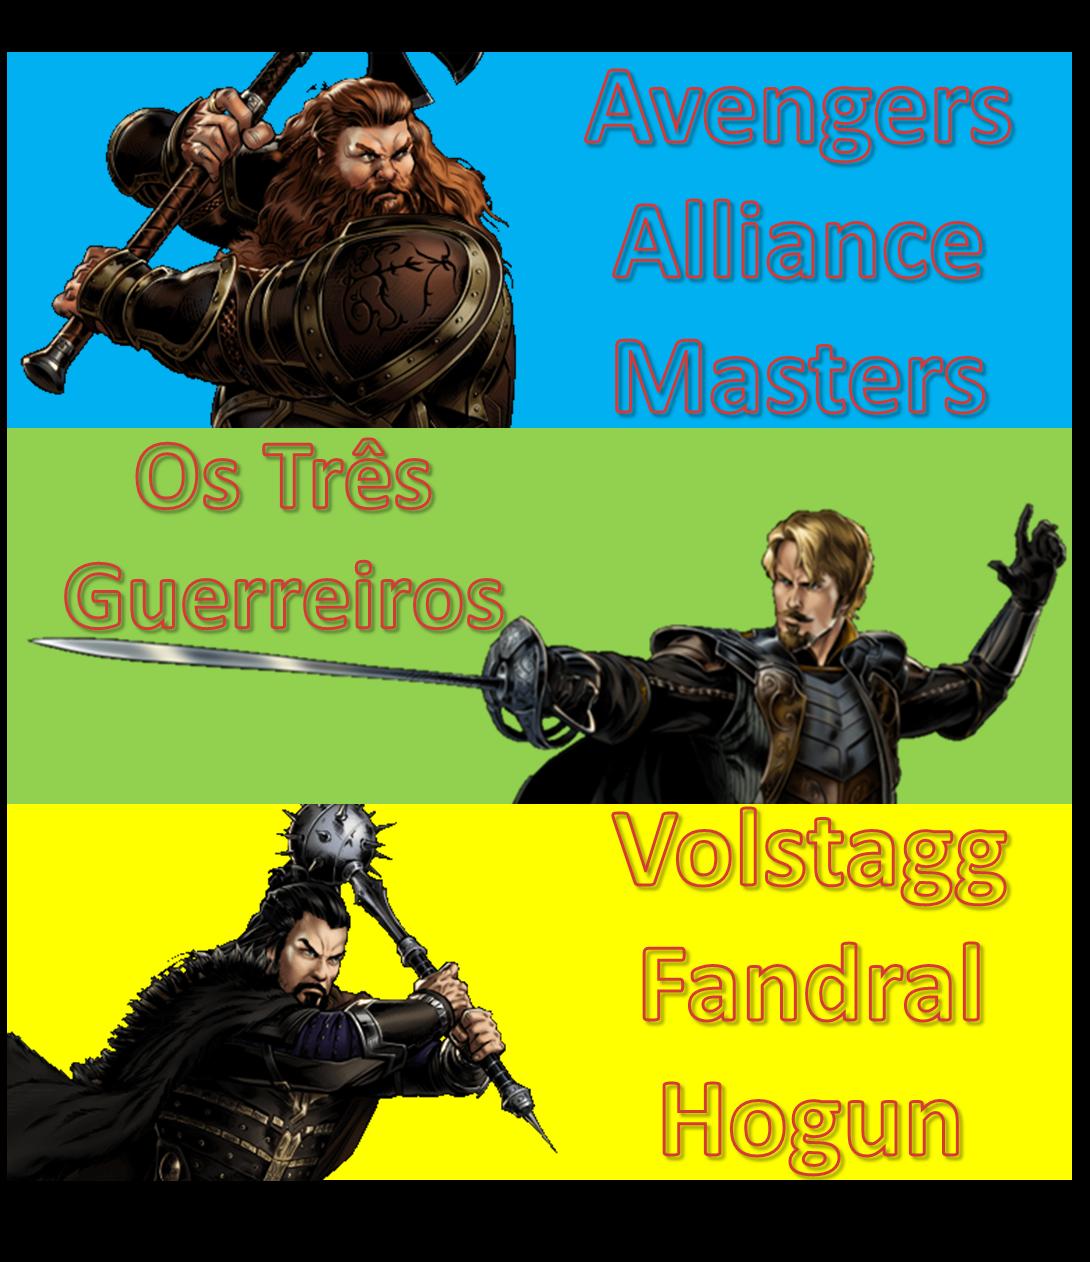 Marvel Avengers Alliance Masters